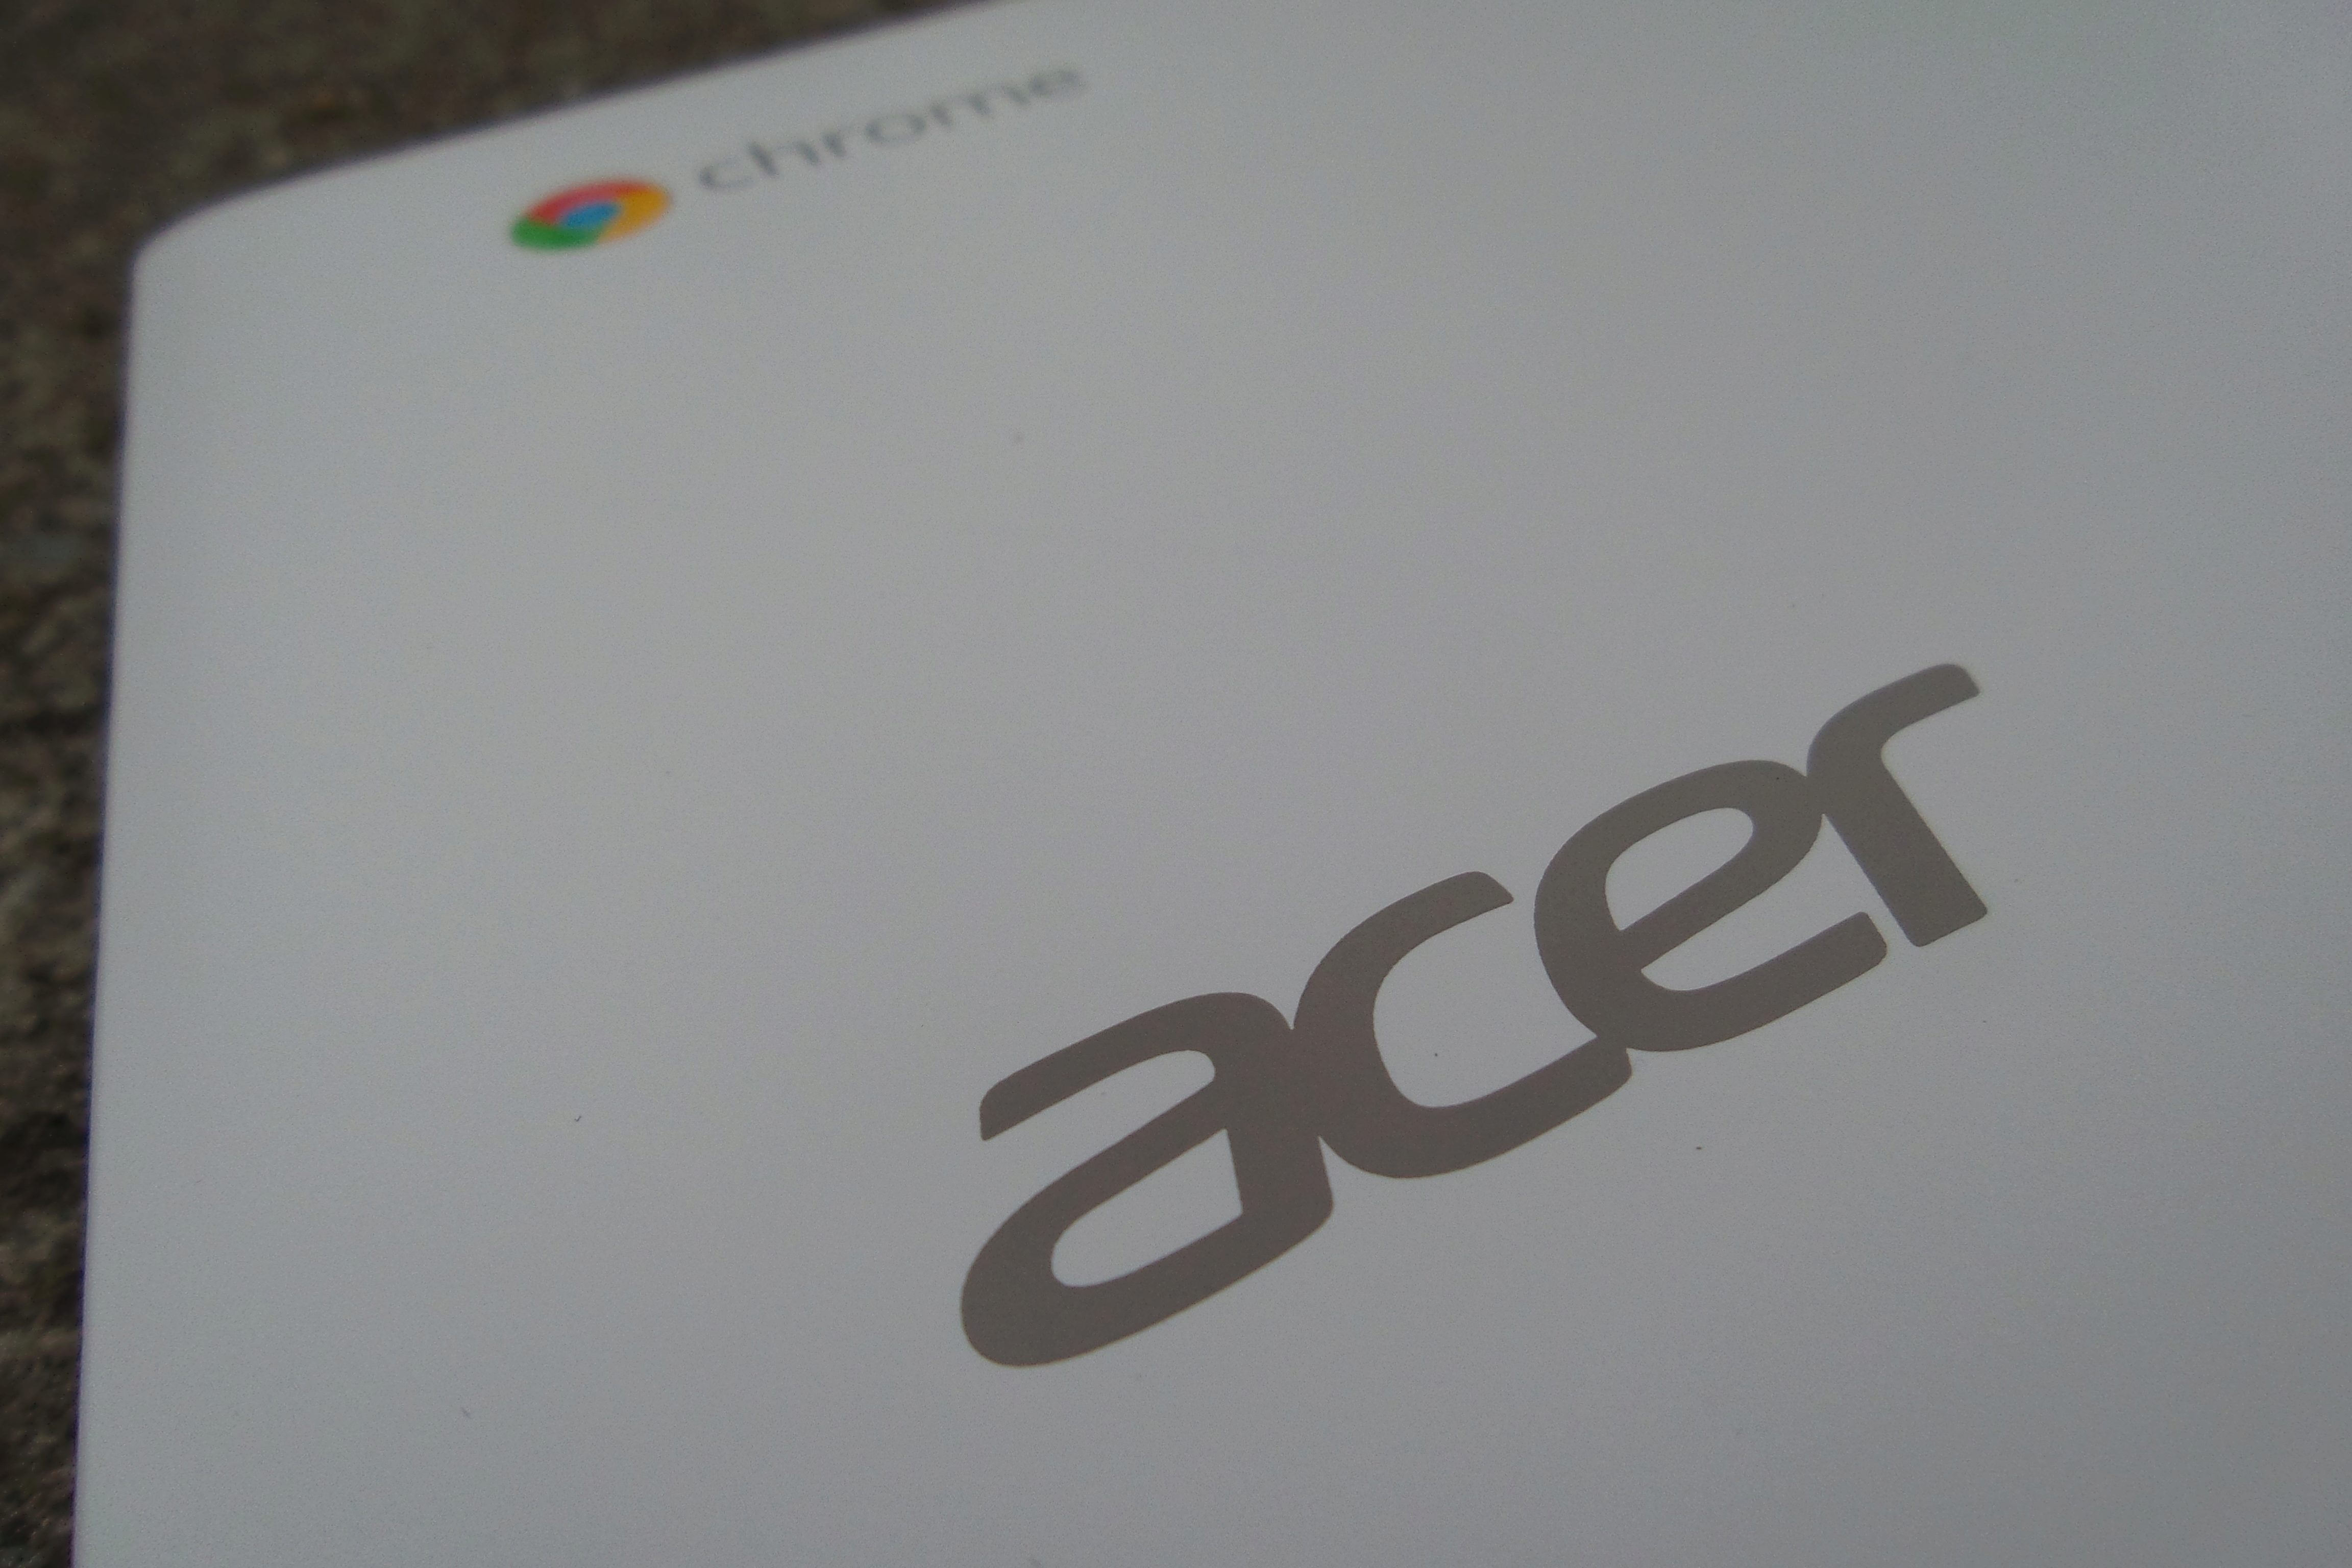 Acer Chromebook 13 Acer logo